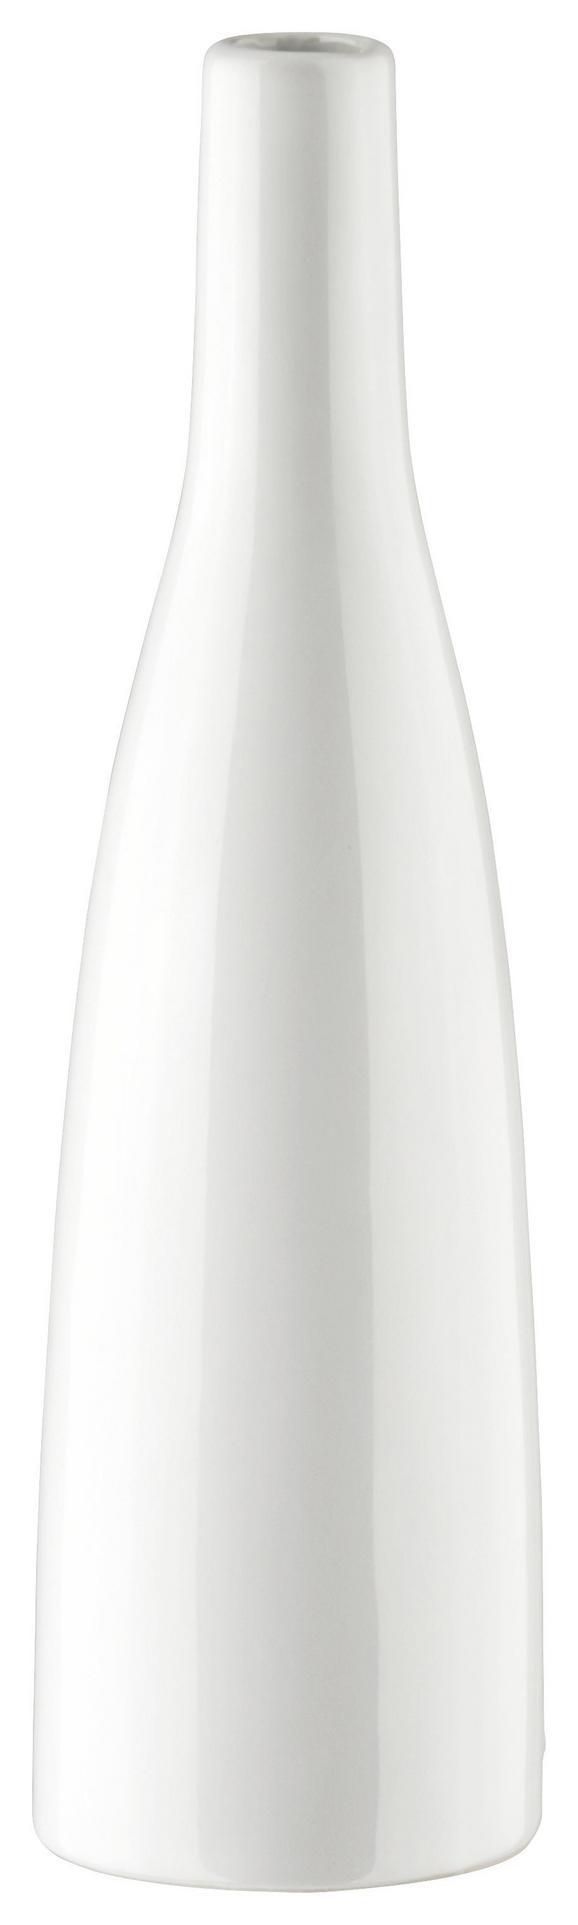 Vase Plancio Weiß - Weiß, MODERN, Keramik (27cm) - Mömax modern living